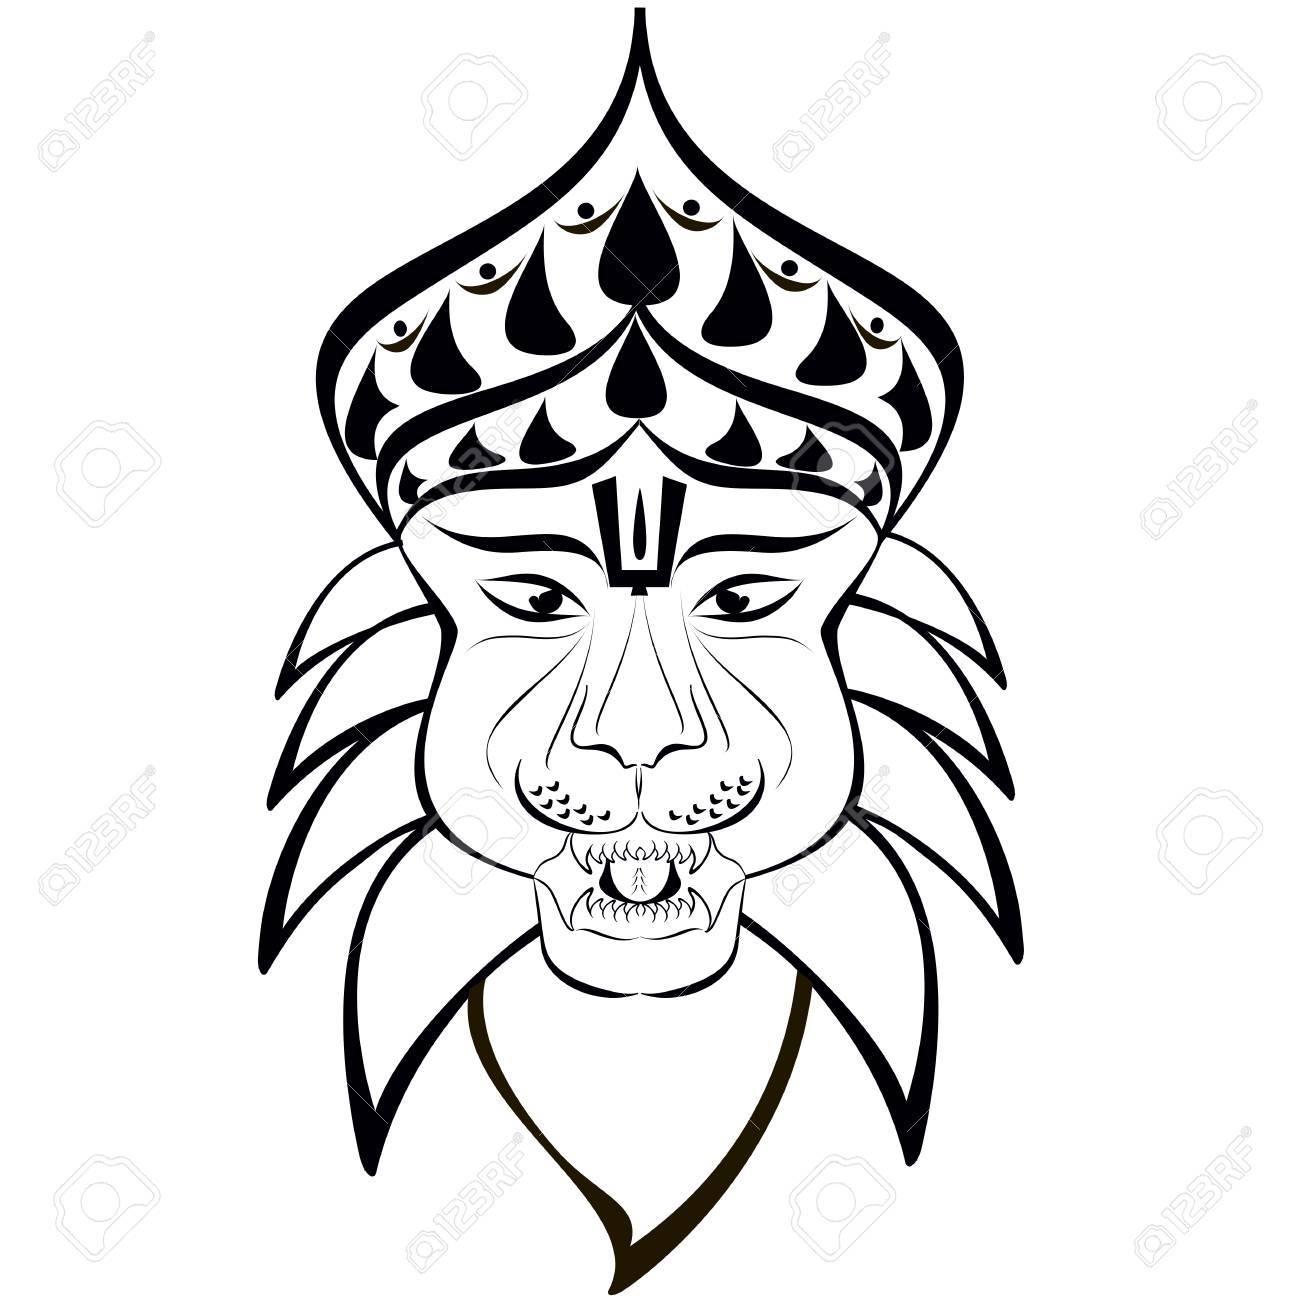 1300x1300 Shri Nrisimha Or Narasimha, 4th Incarnation Of Lord Vishnu As